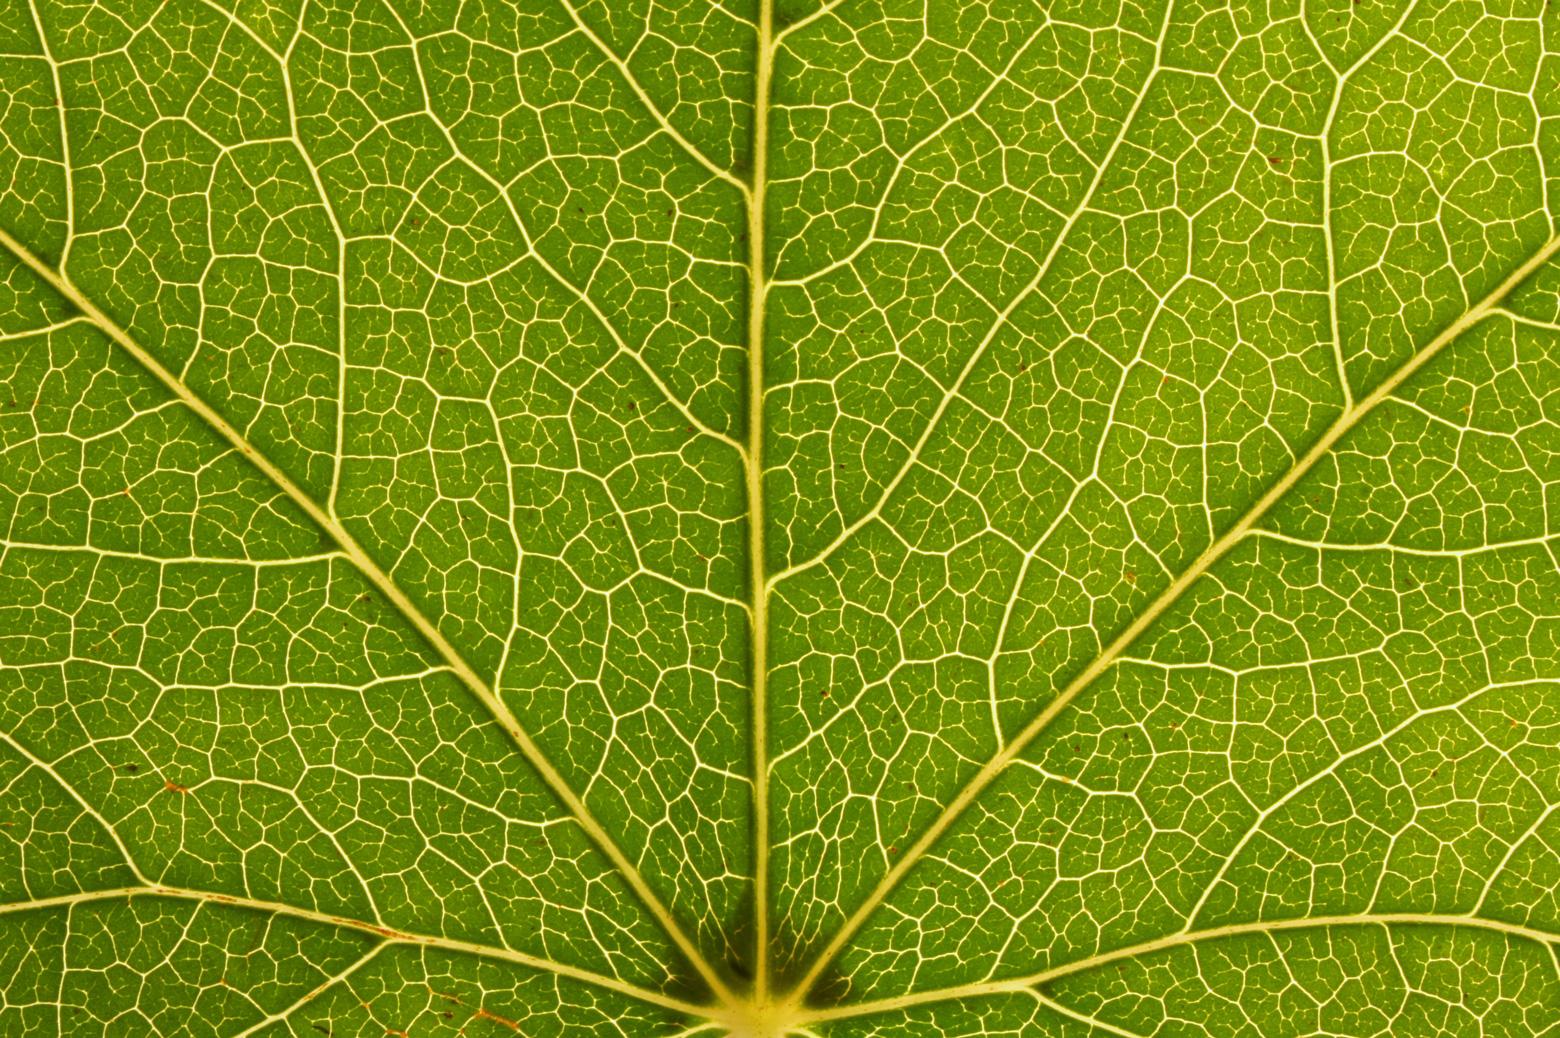 a close up shot of a leaf showing its fractal pattern